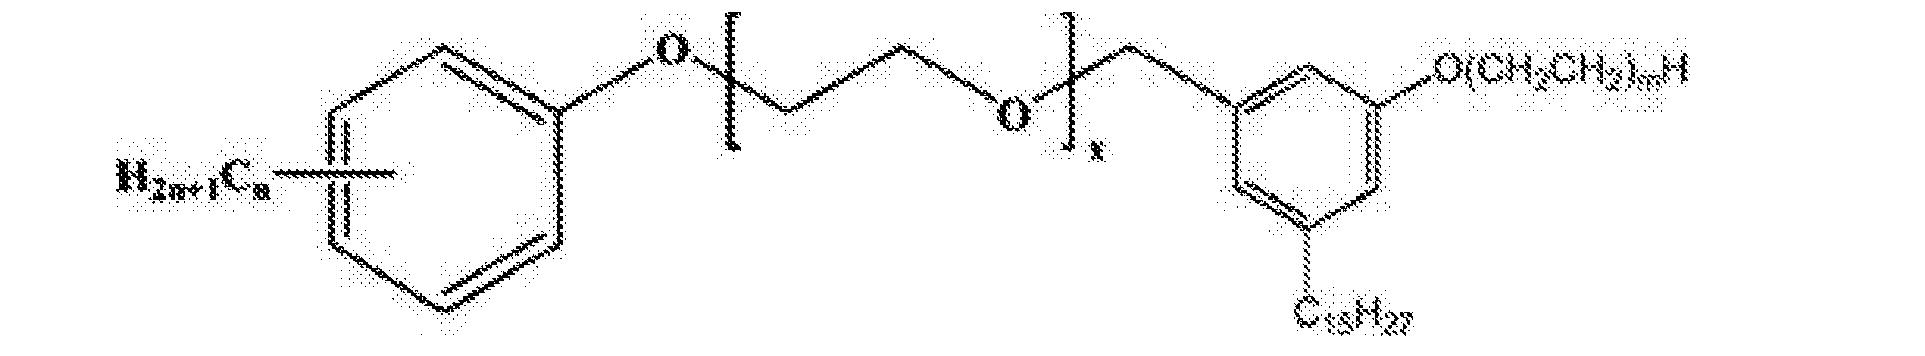 Figure CN106893640AD00042